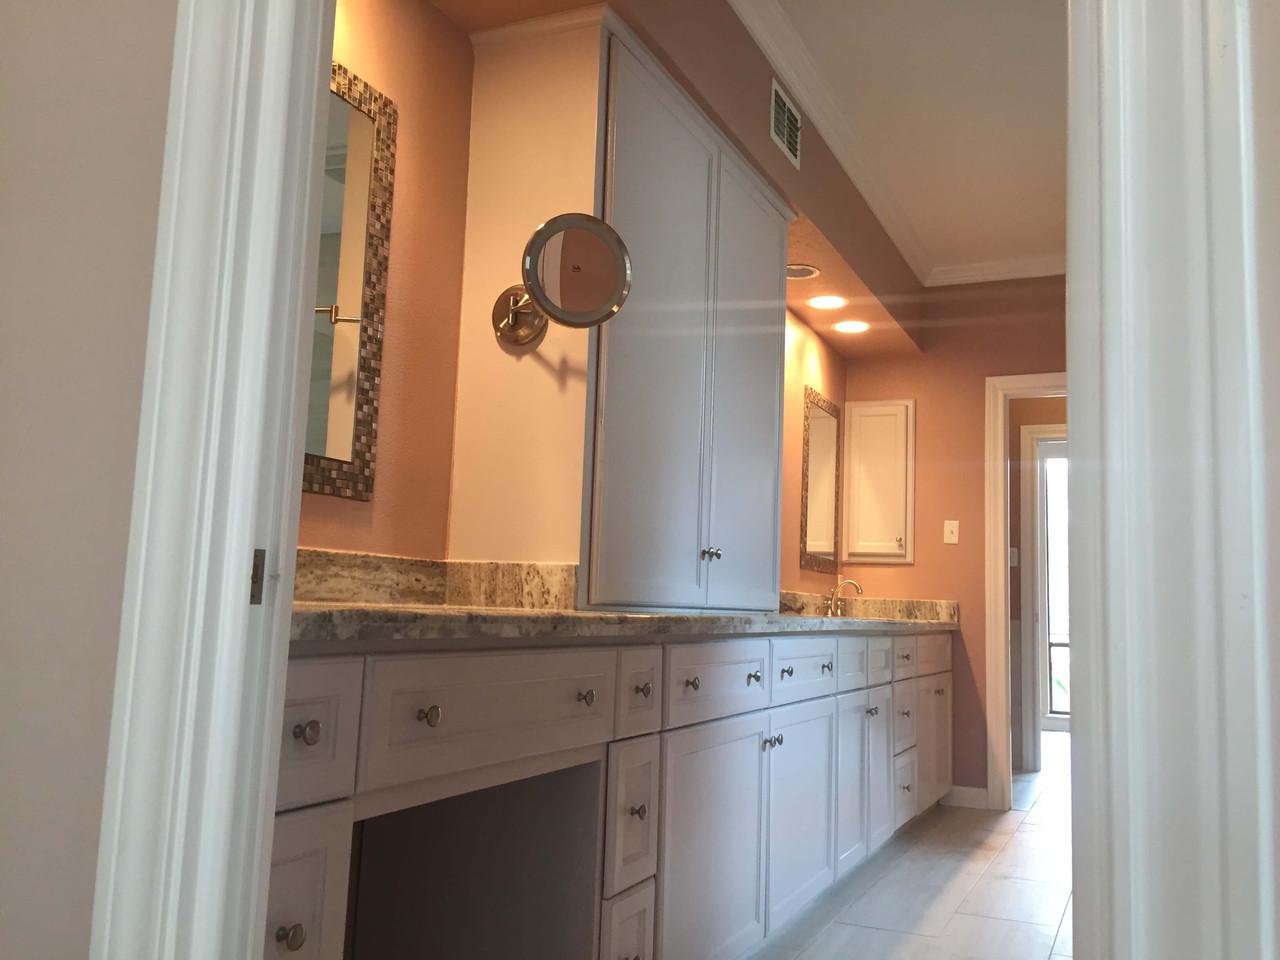 double sink granite countertop luxury bathroom